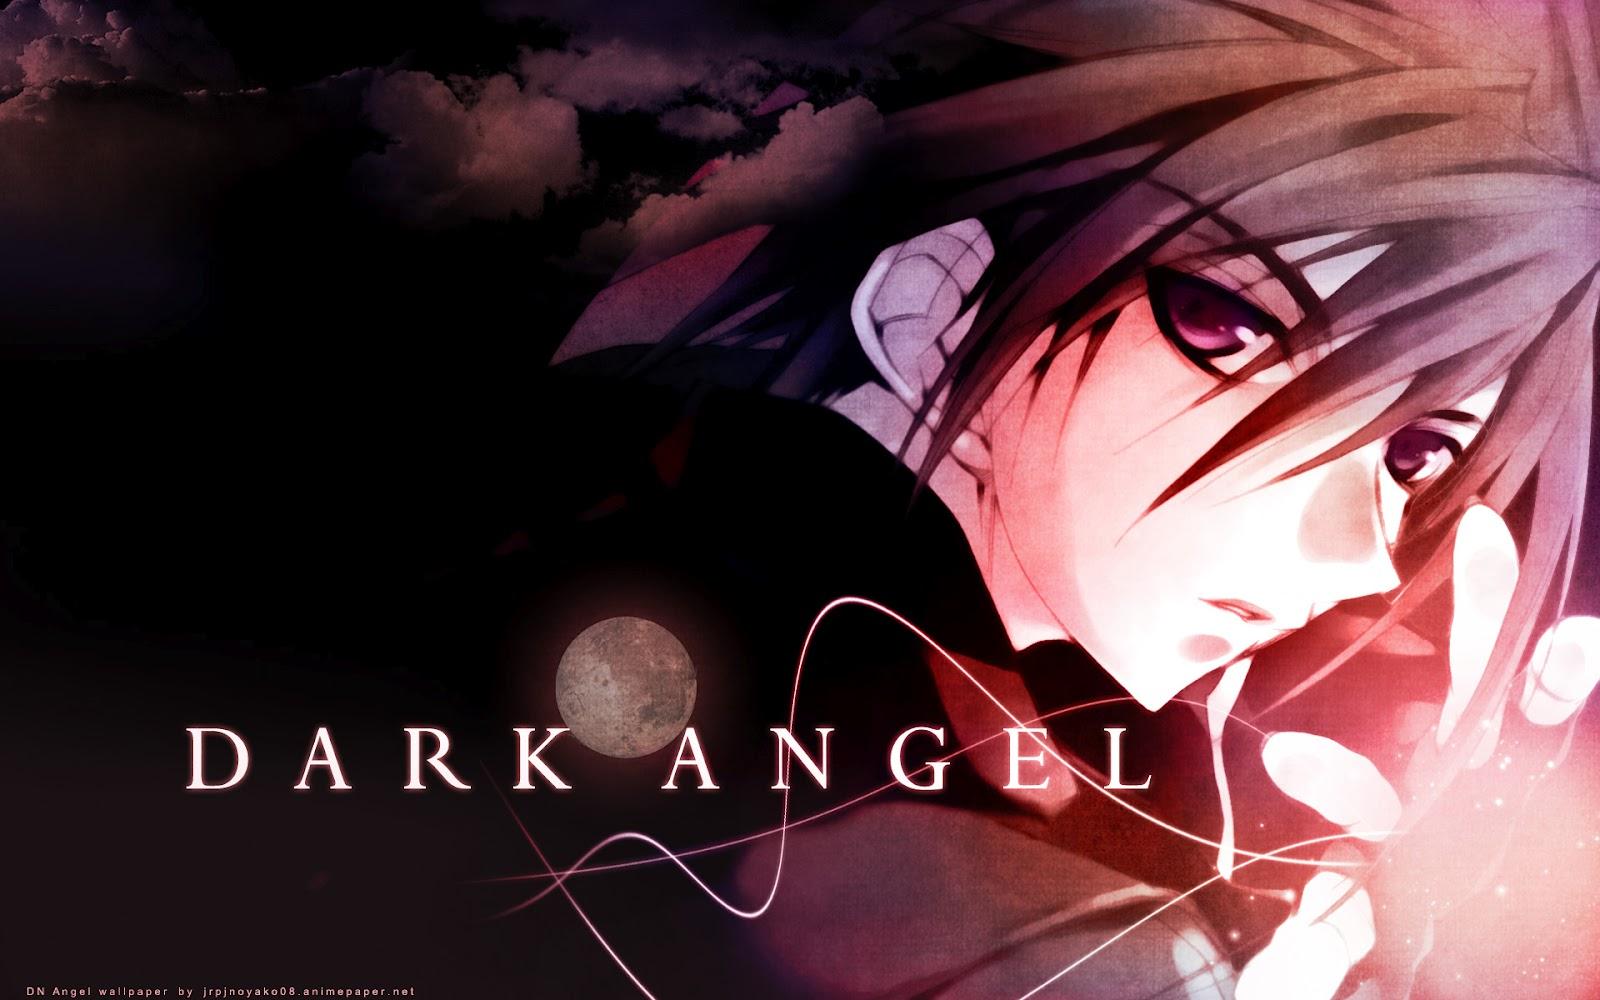 http://2.bp.blogspot.com/-kOByY059r3I/T9d4ylJcN6I/AAAAAAAACfI/a4uAqbQ152Y/s1600/DN-Angel-Wallpapers-049.jpg